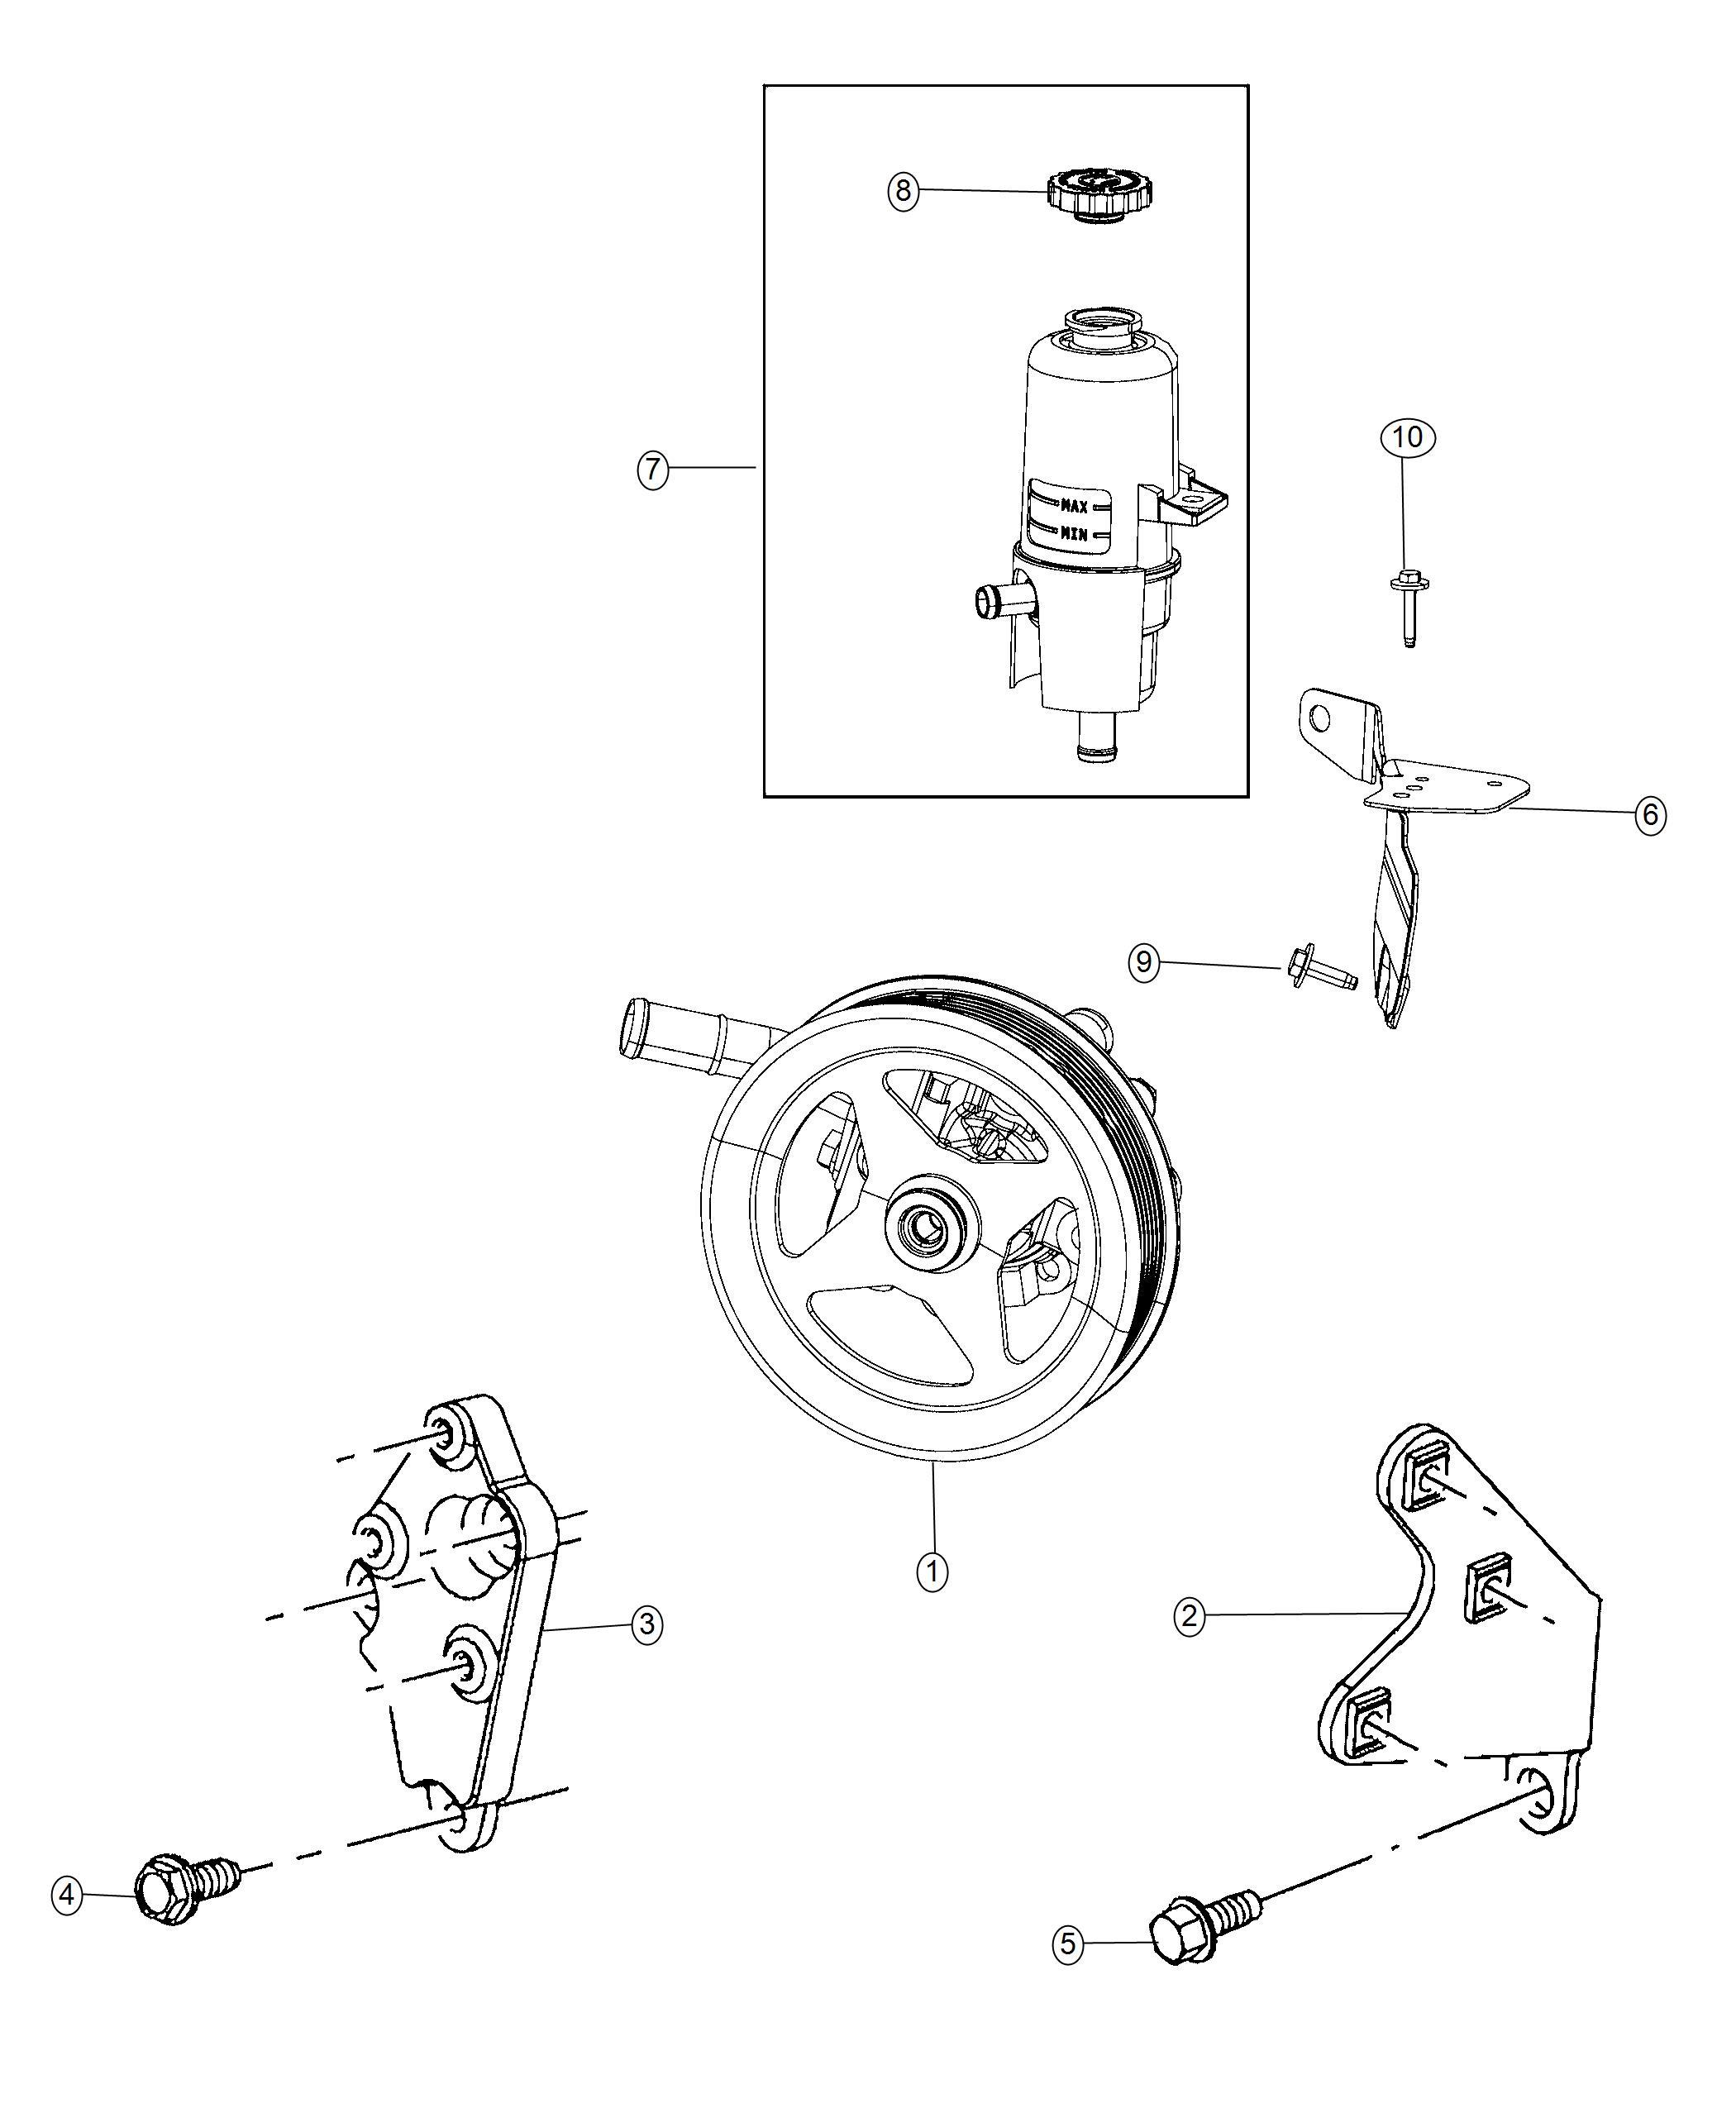 Ram Reservoir Power Steering Fluid